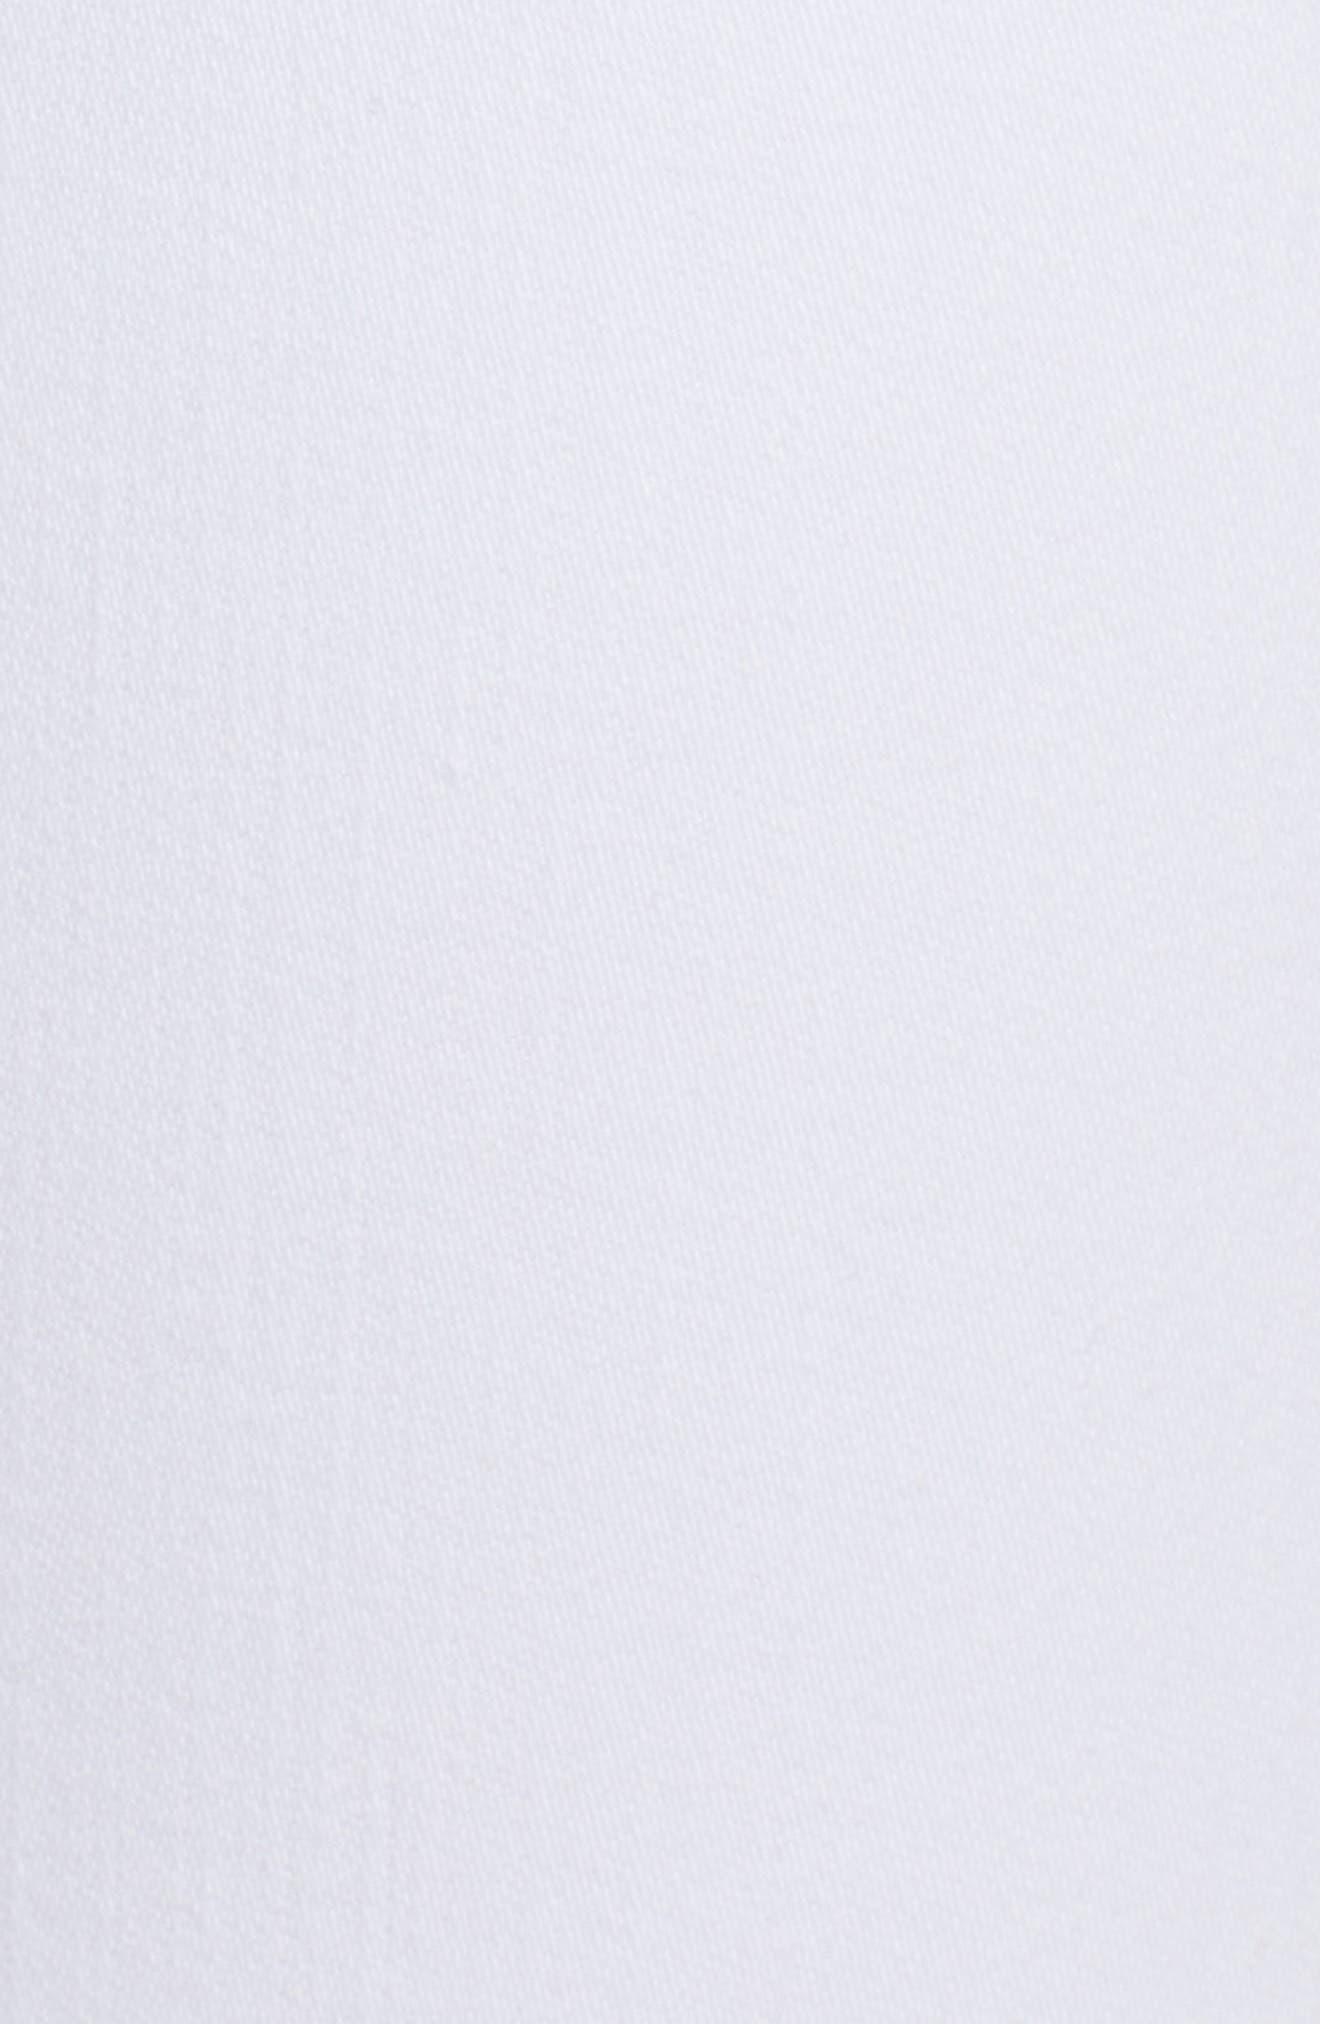 HUDSON JEANS,                             Collin Skinny Jeans,                             Alternate thumbnail 6, color,                             WHITE